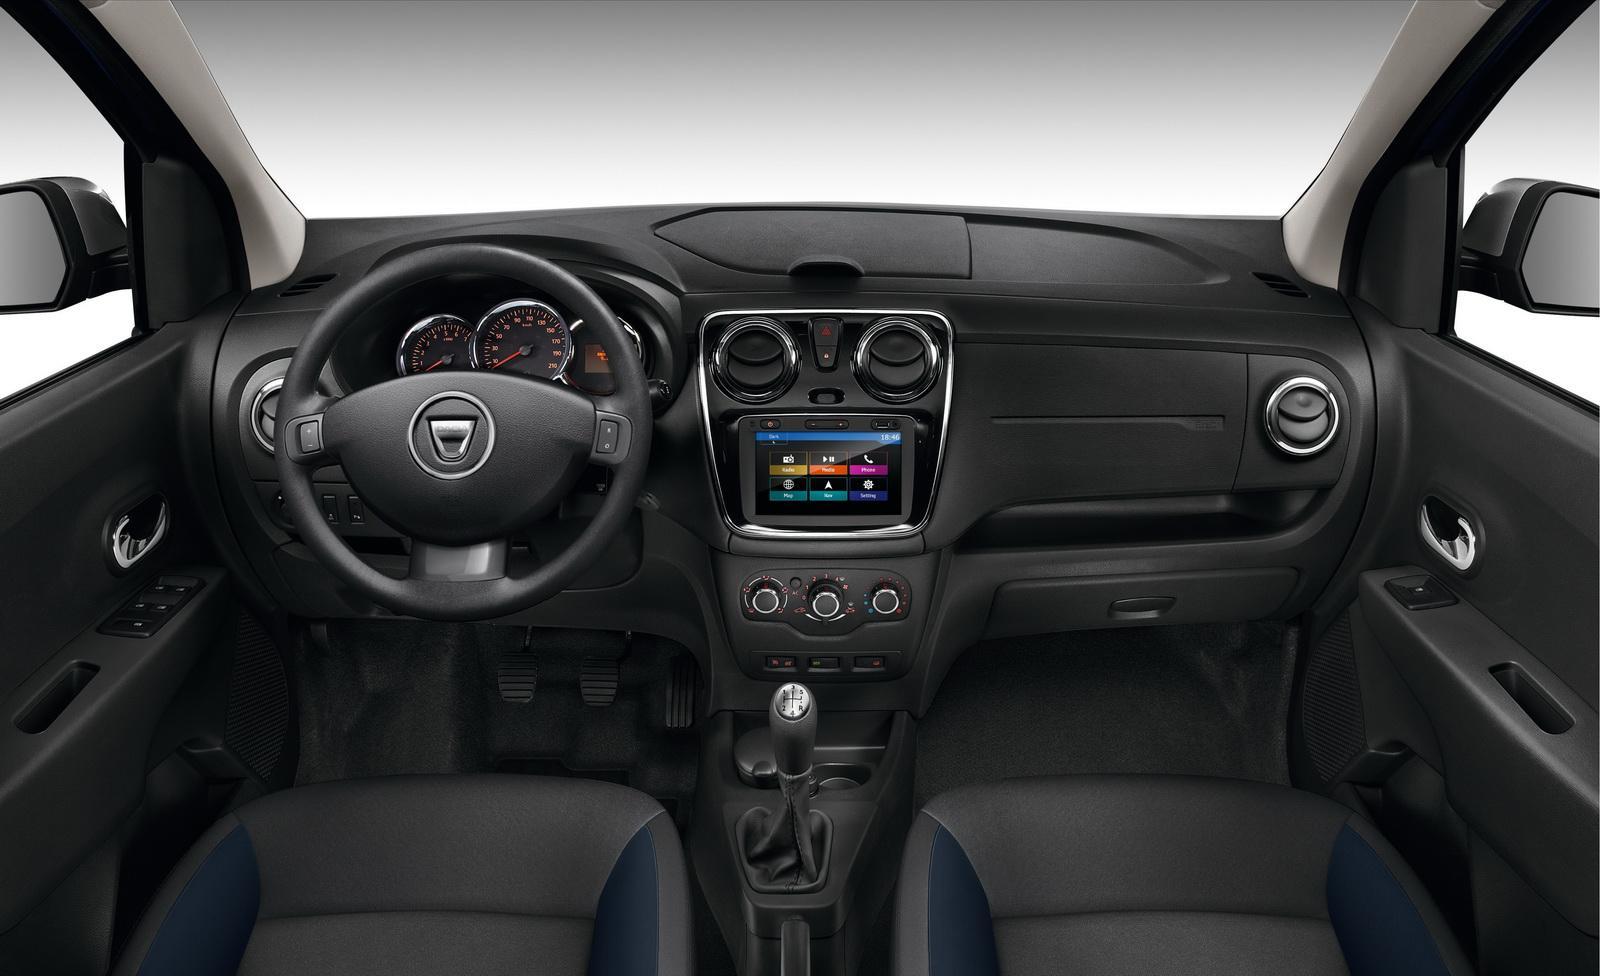 Dacia Lodgy Anniversary